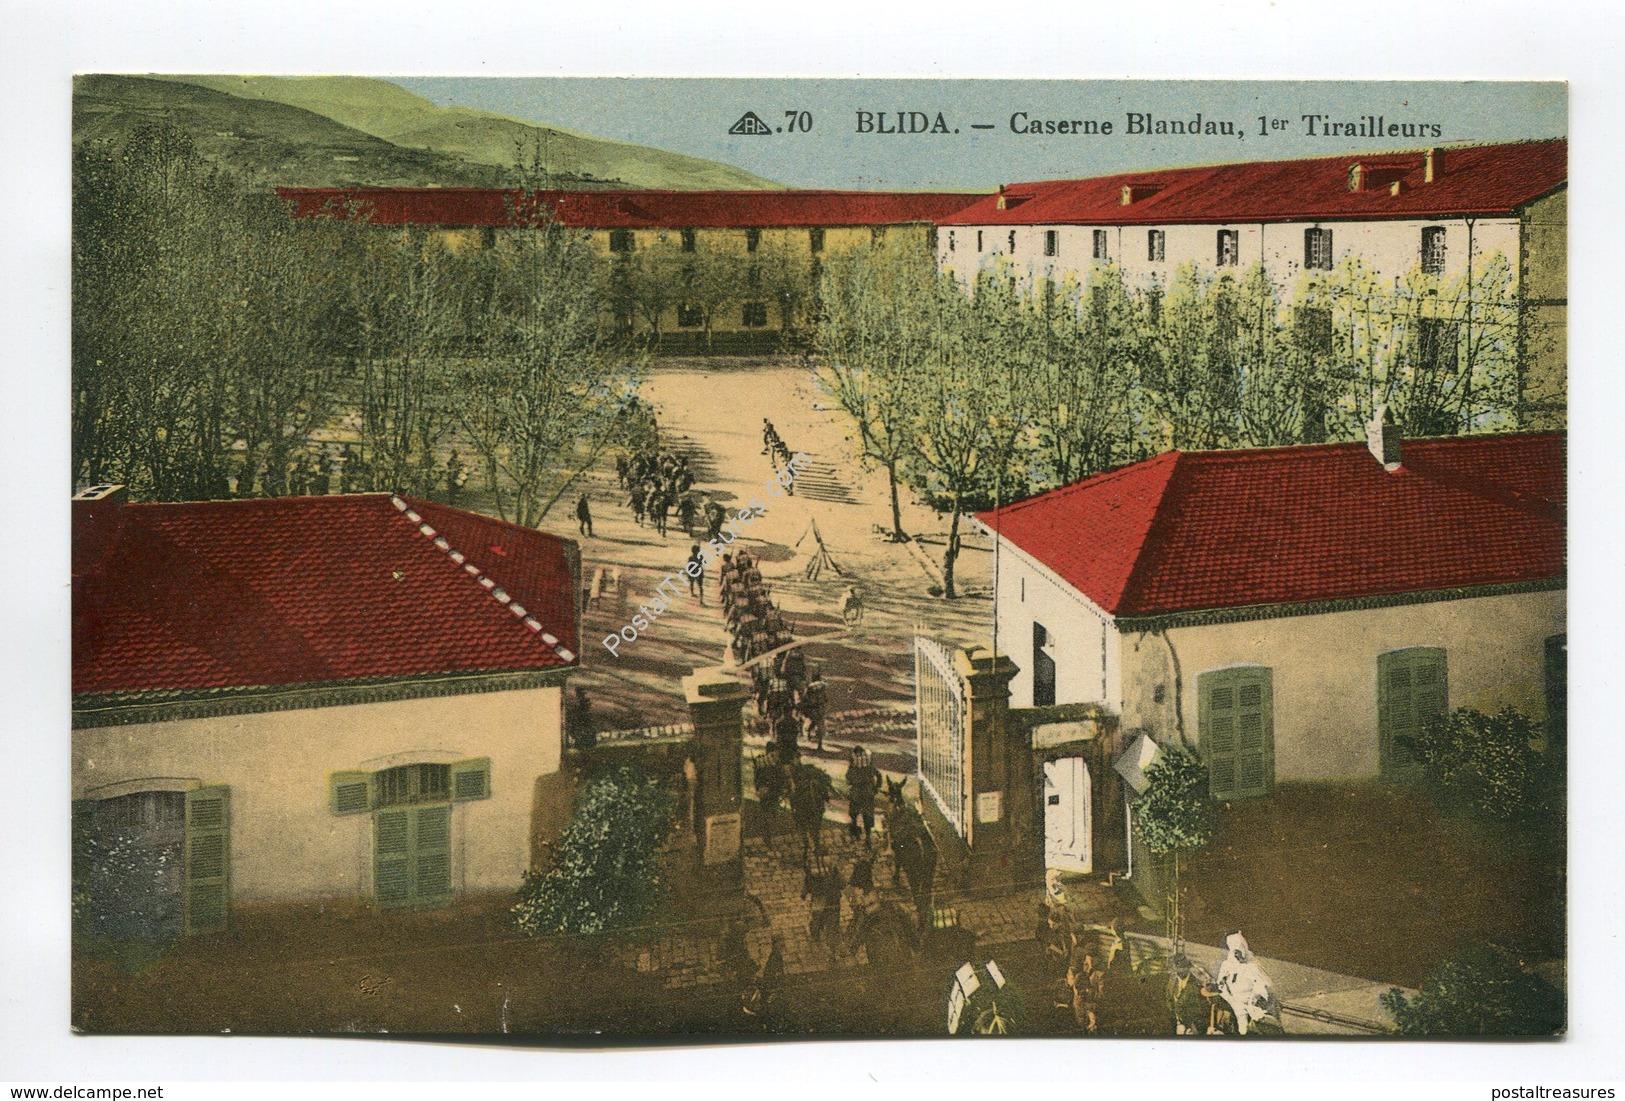 Caserne Blandau 1er Tirailleurs - Blida - Blida